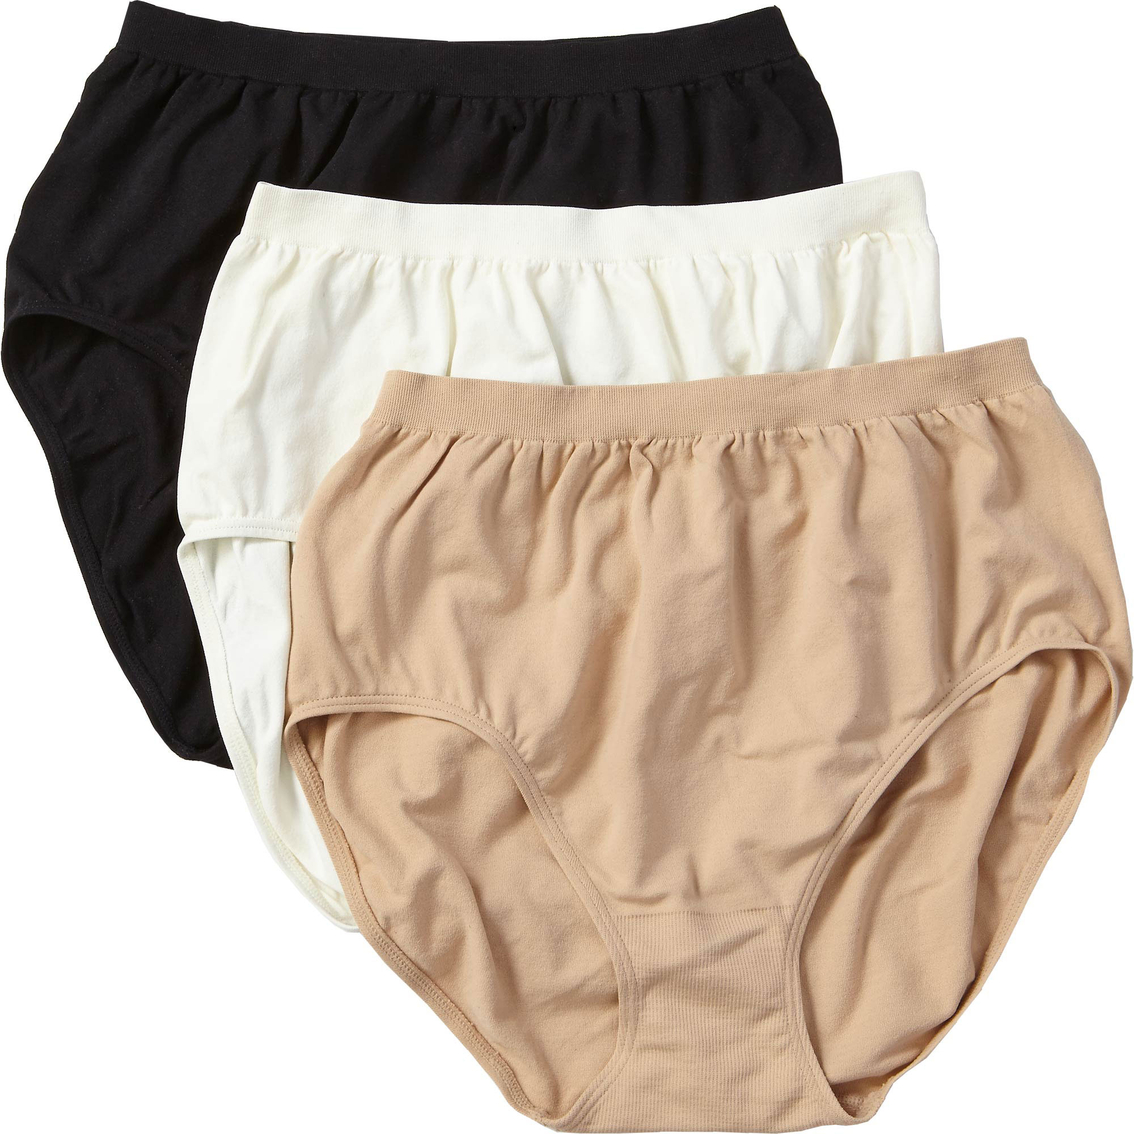 1c6d3c9d507d Jockey Comfies Cotton Microfiber Briefs 3 Pk. | Panties | Apparel ...